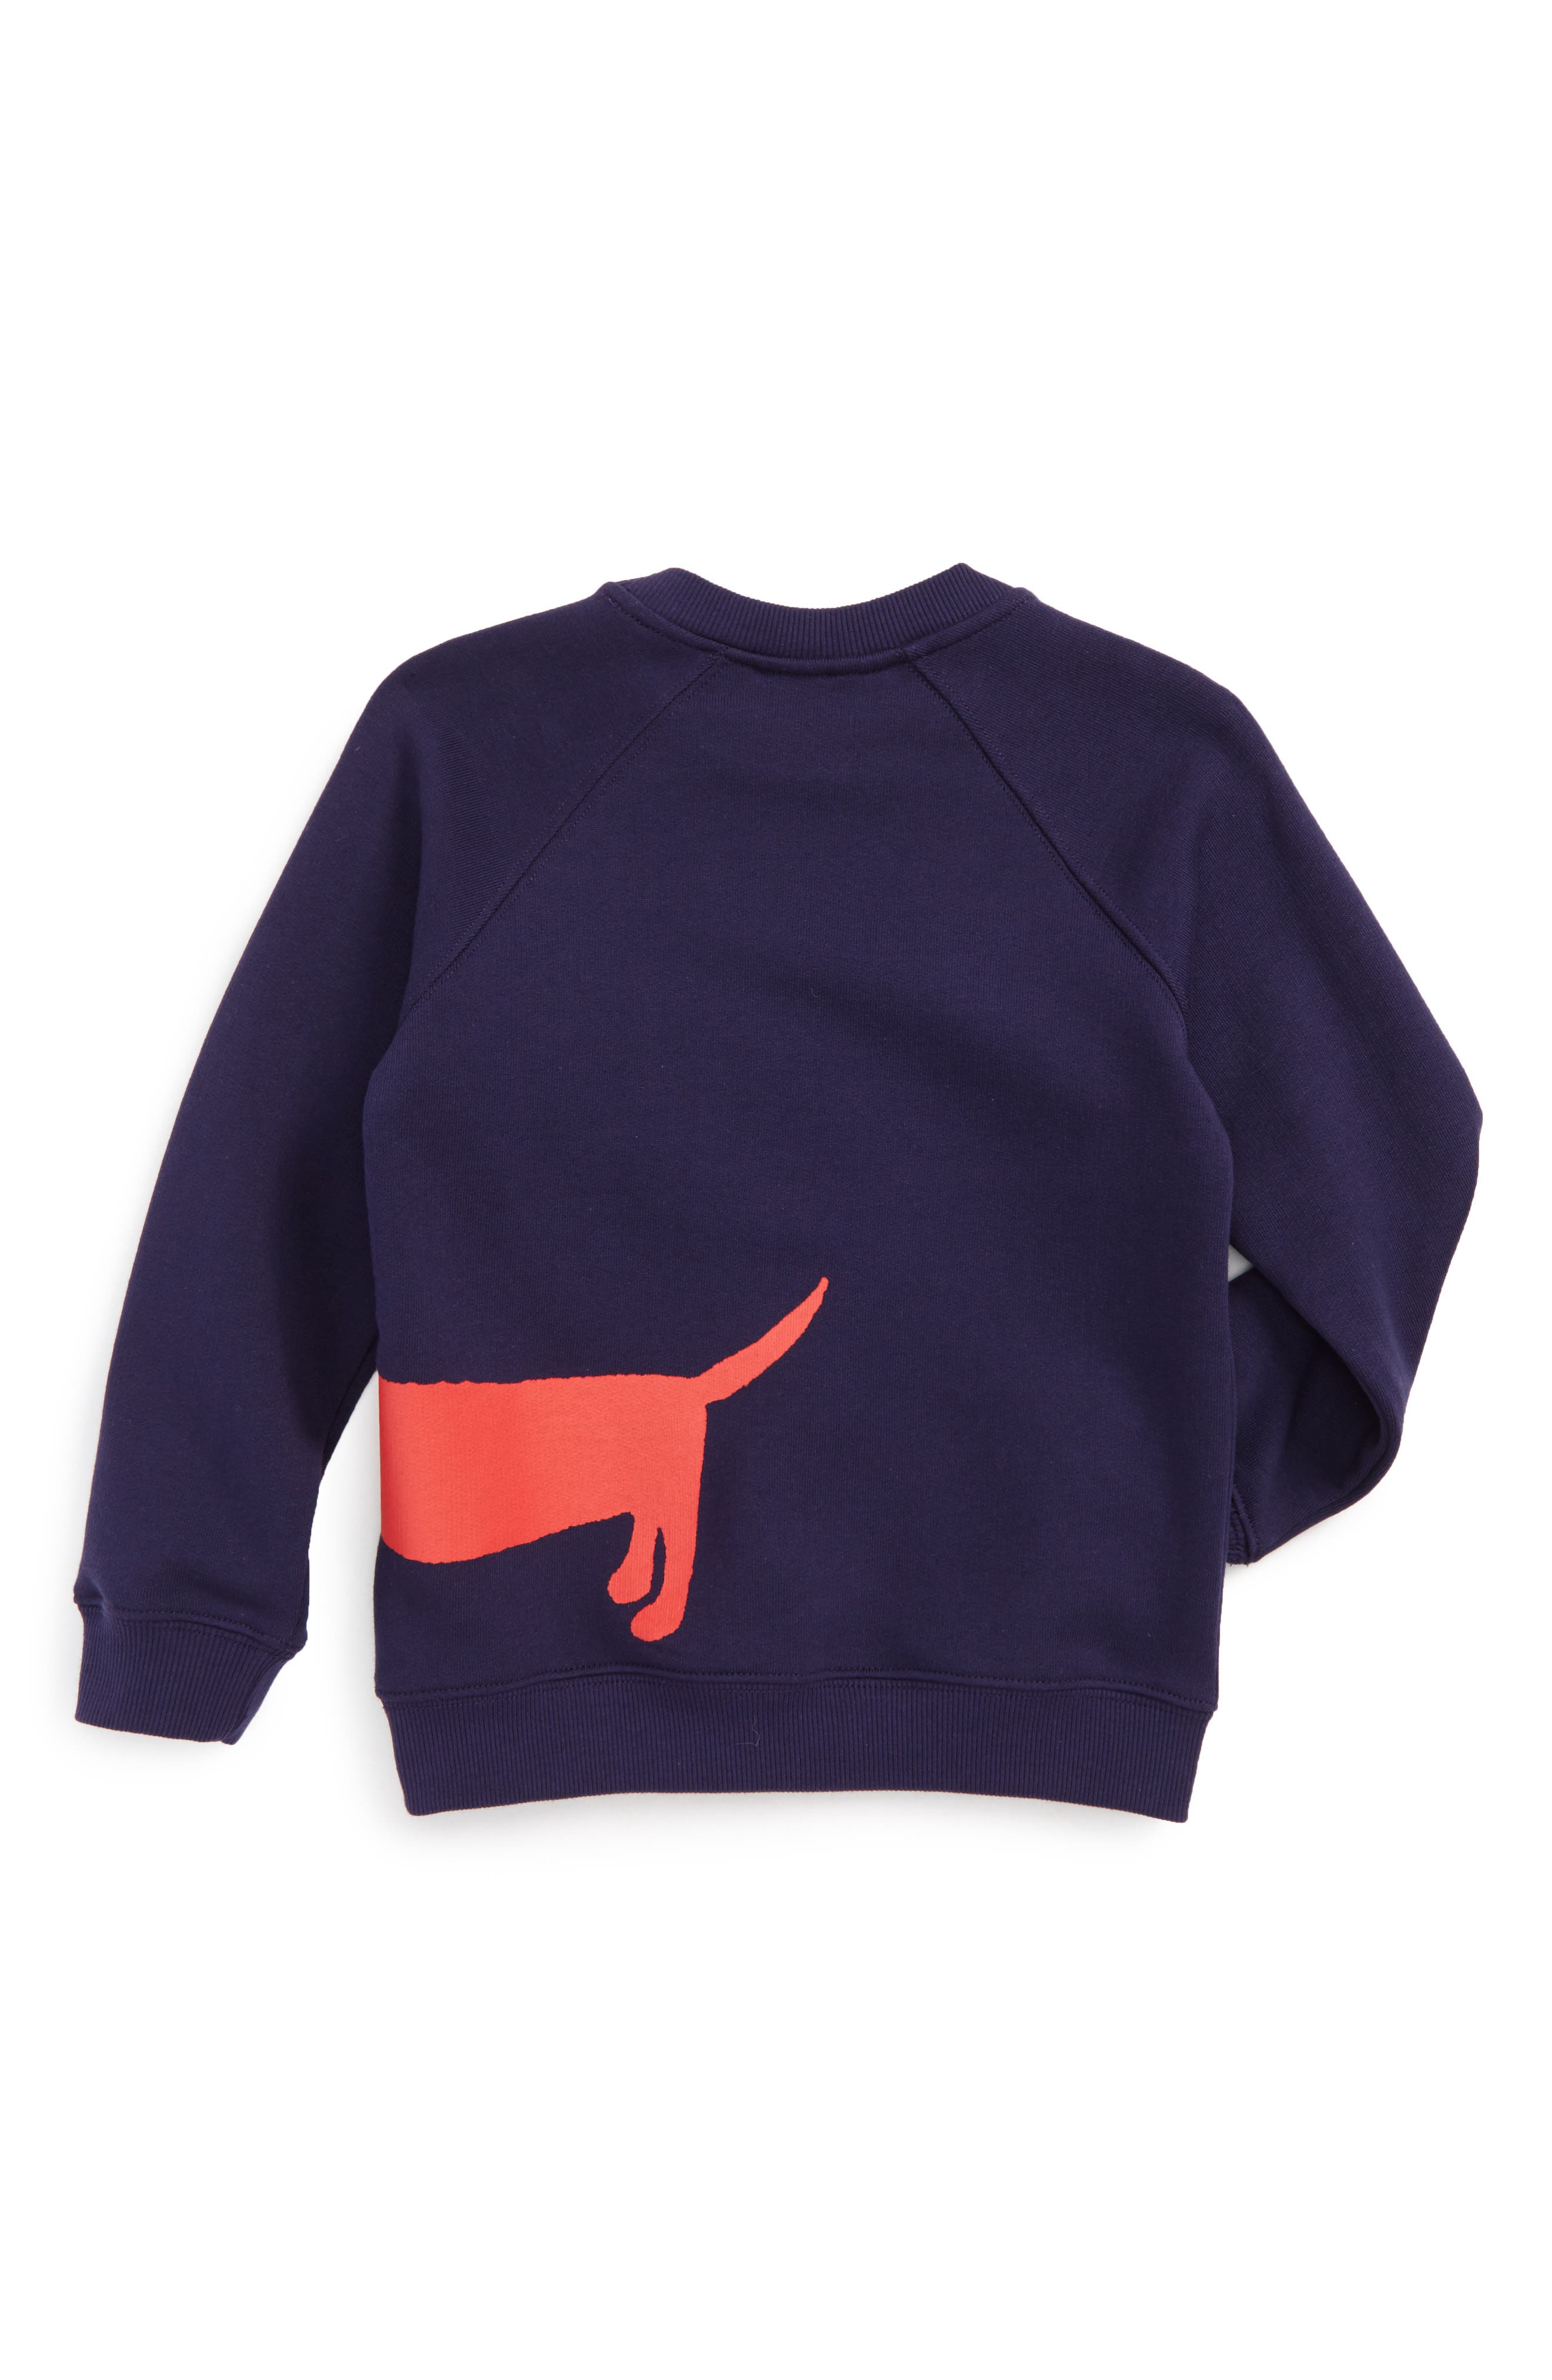 Alternate Image 2  - Mini Rodini Dog Sweatshirt (Toddler Boys & Little Boys)